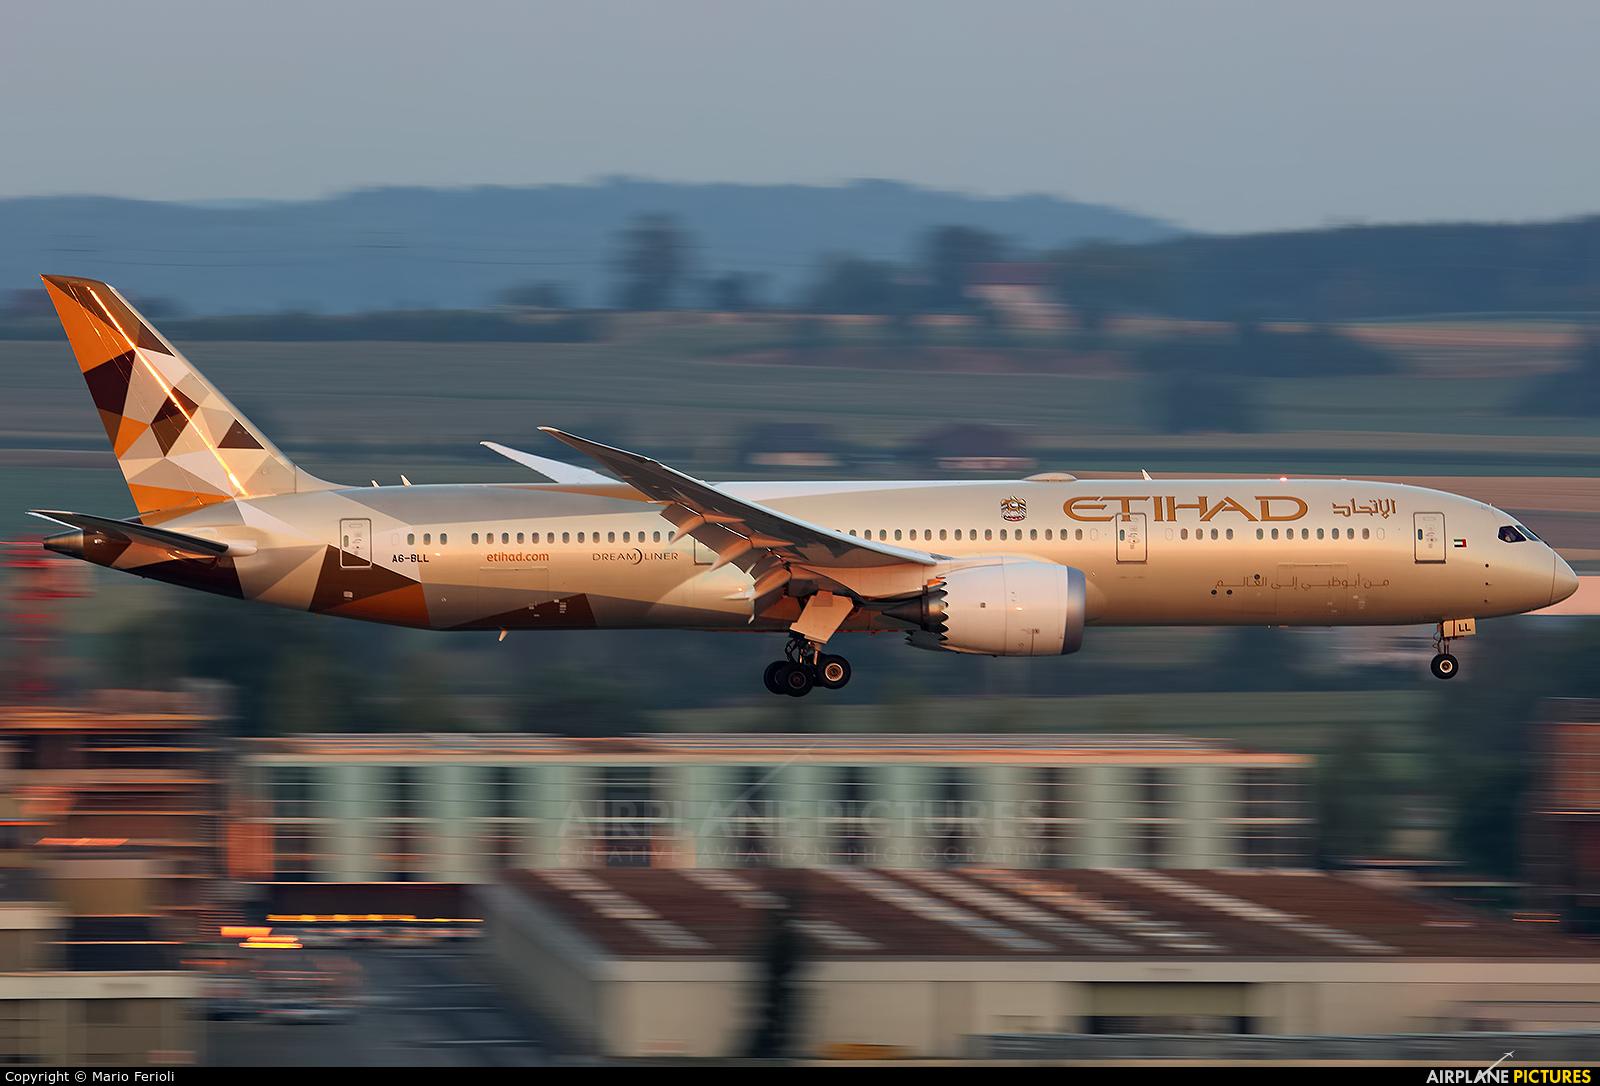 Etihad Airways A6-BLL aircraft at Zurich